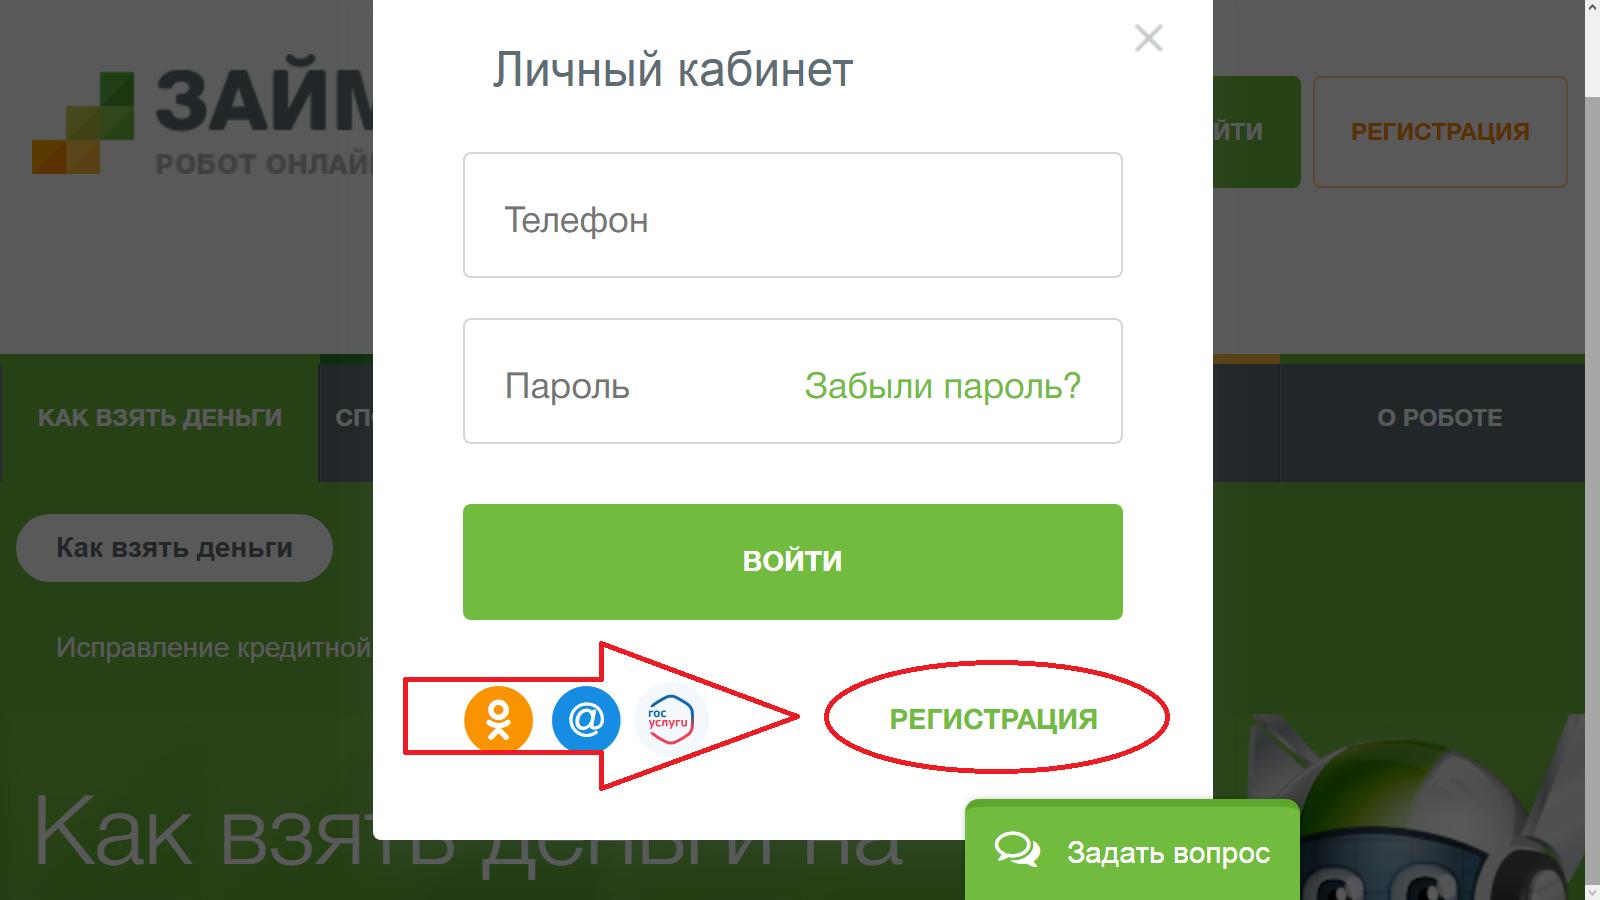 мфо займер личный кабинет вход доллар онлайн в банках москвы